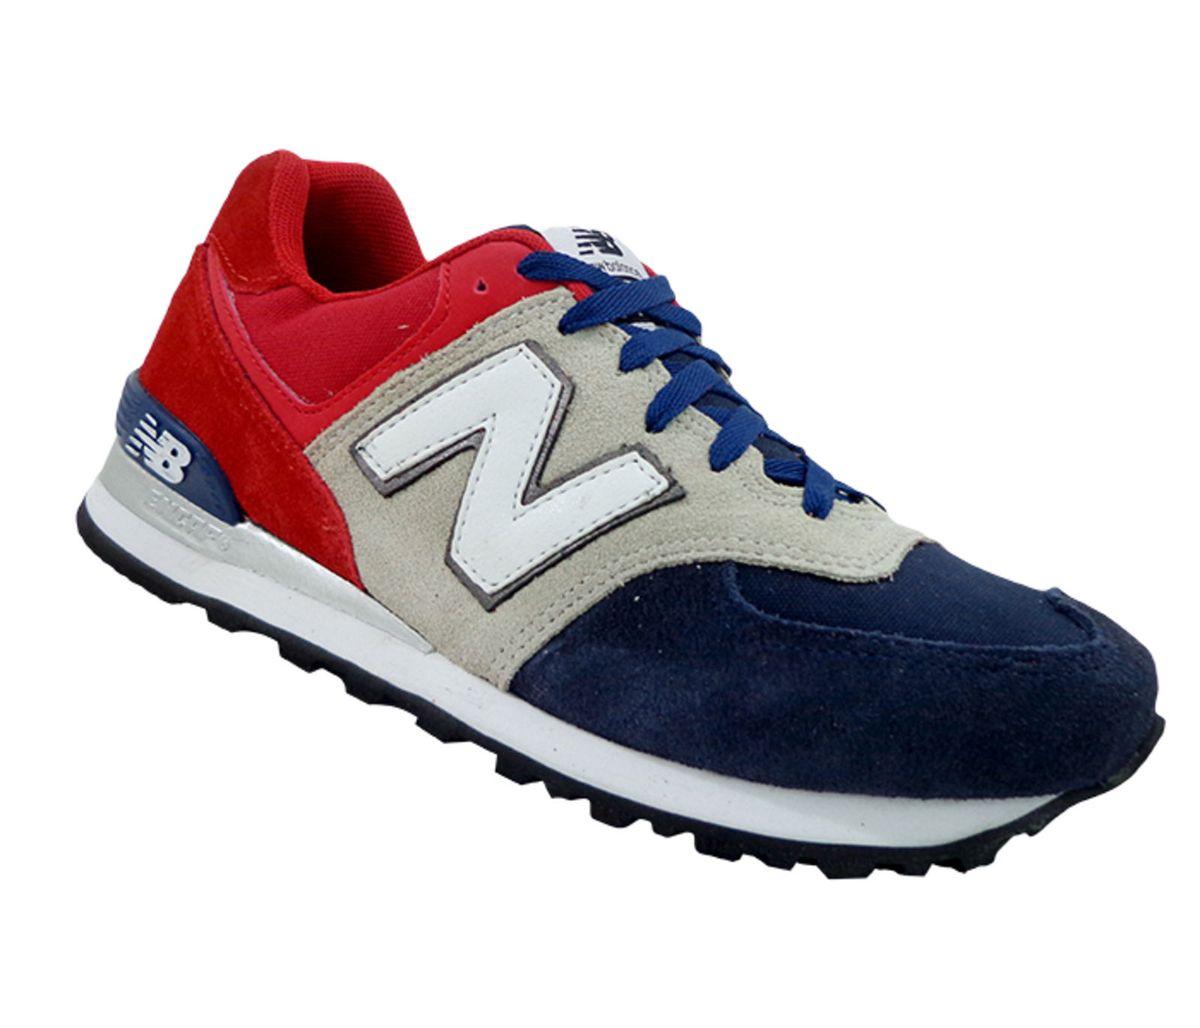 bb8a971a128 Tênis New Balance 574 Vermelho